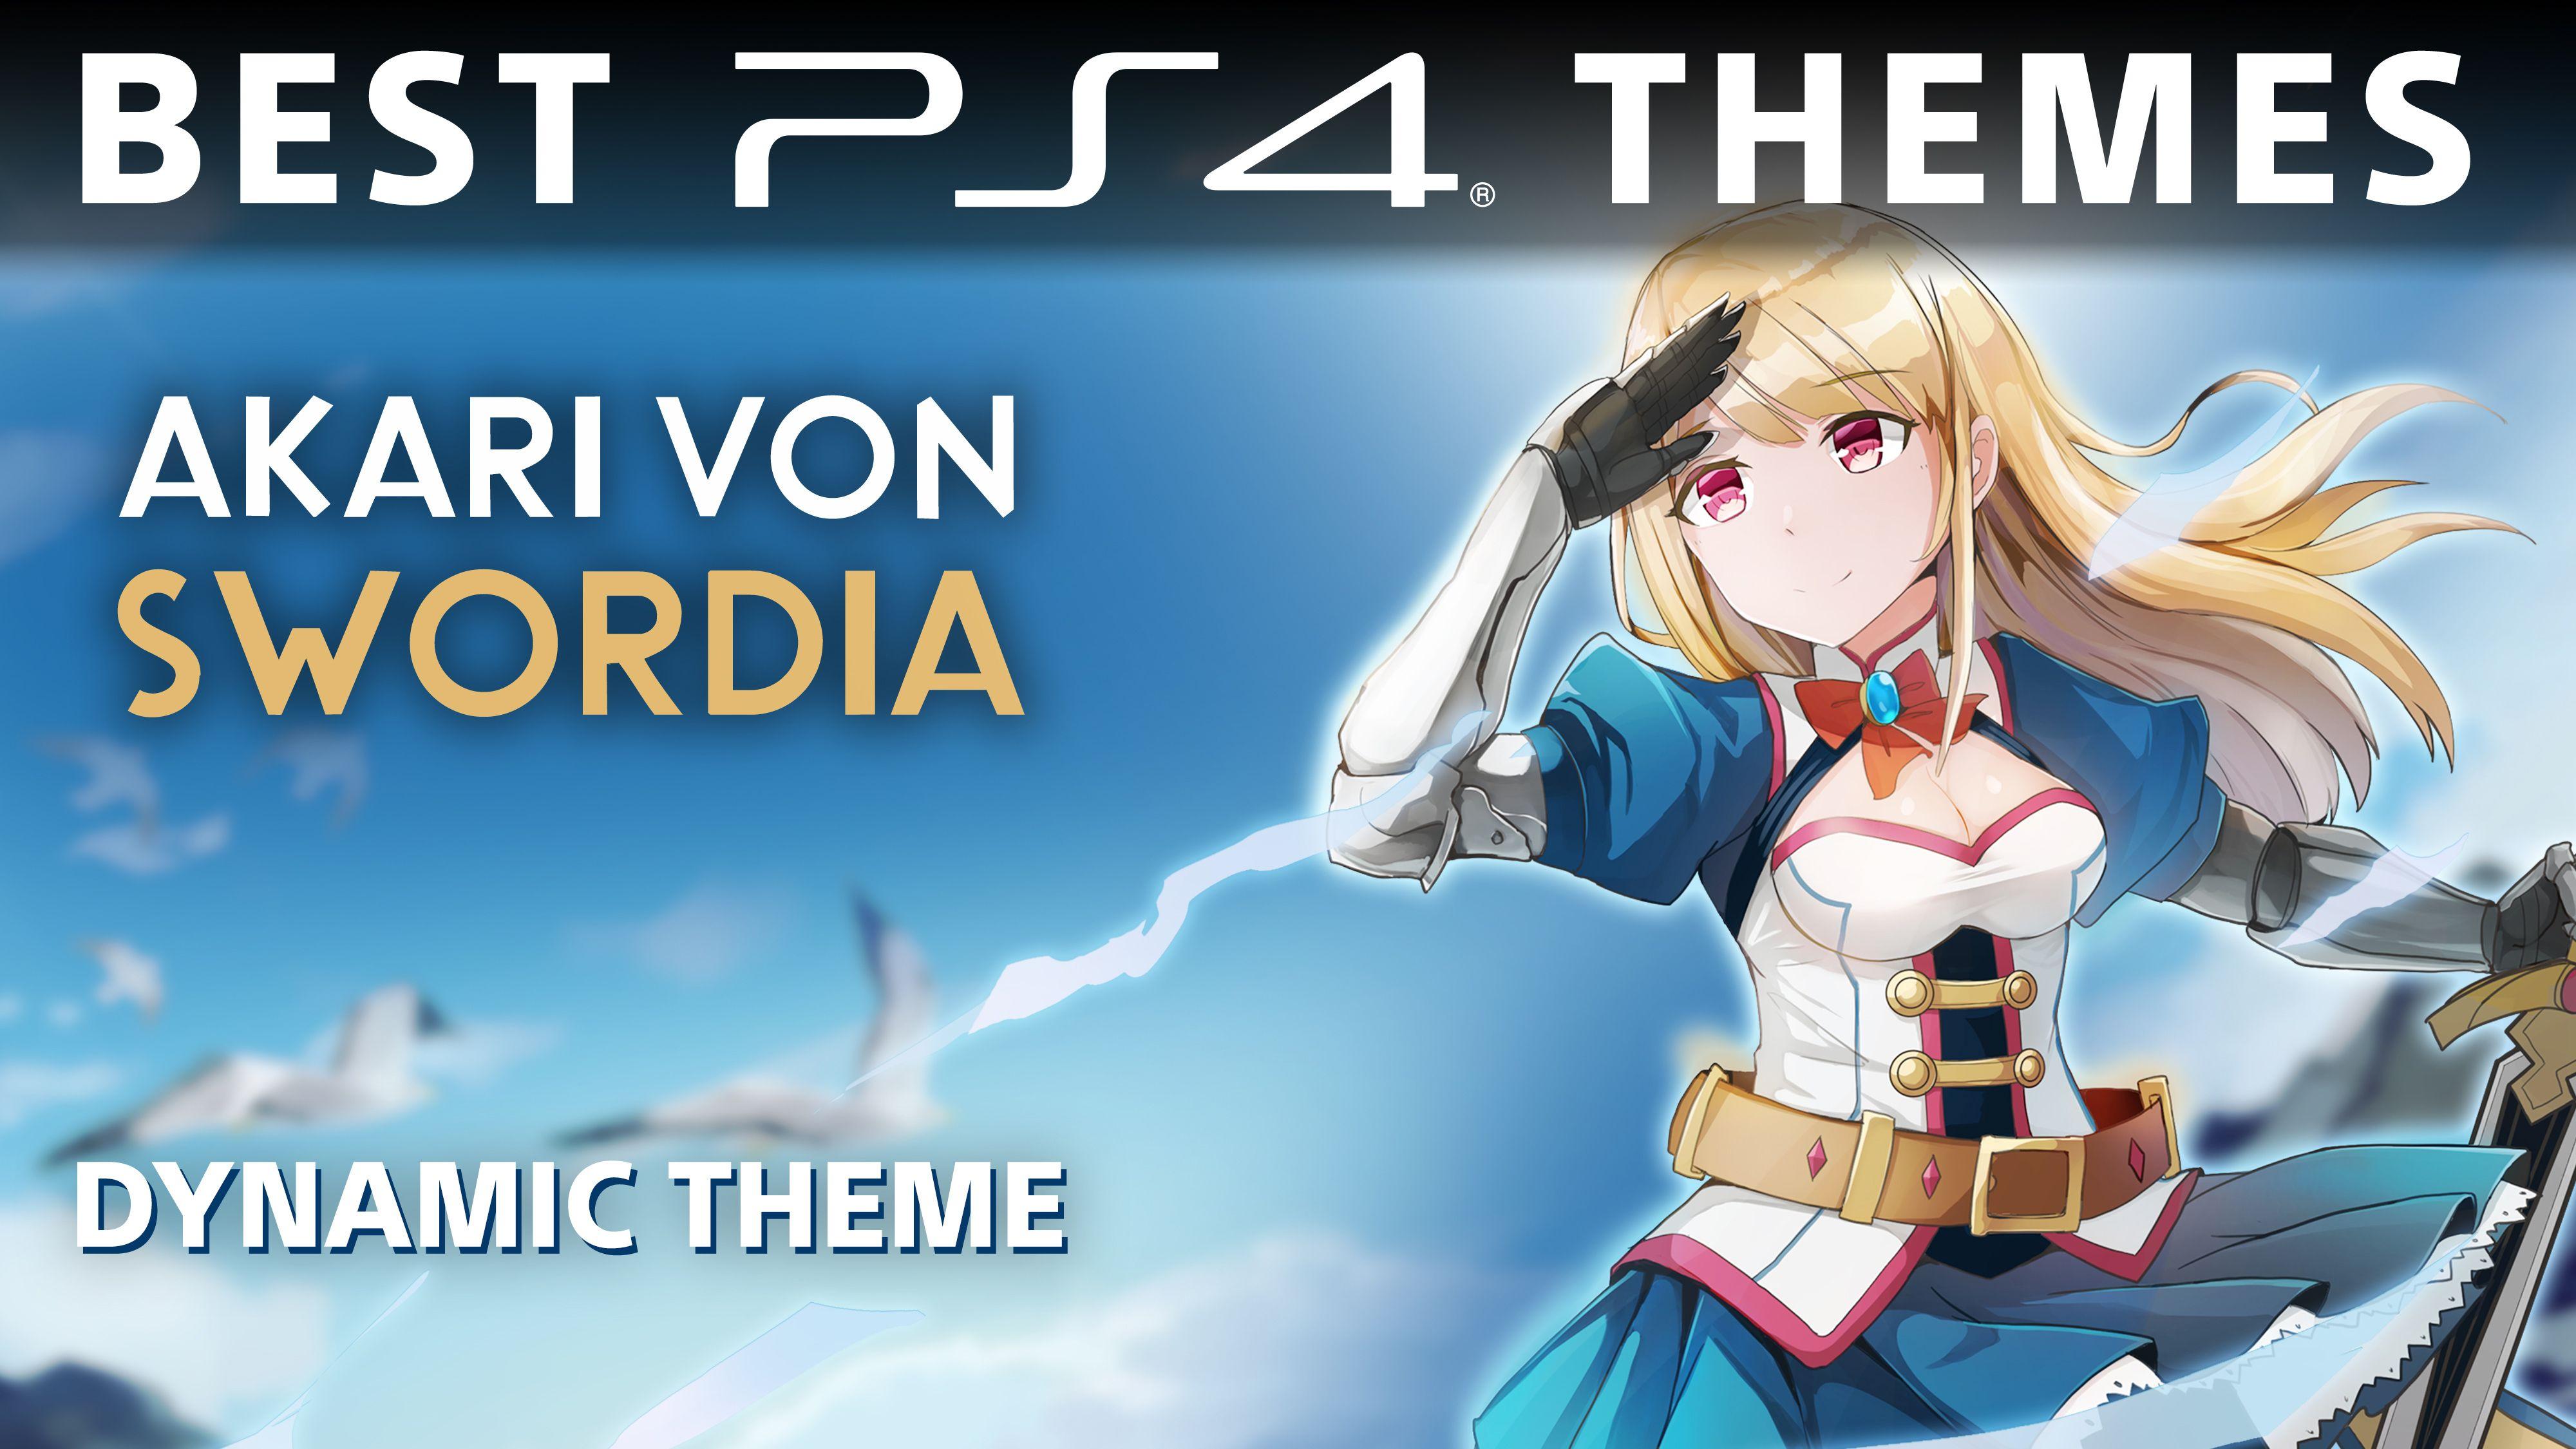 Akari von swordia dynamic theme only on playstation buy https